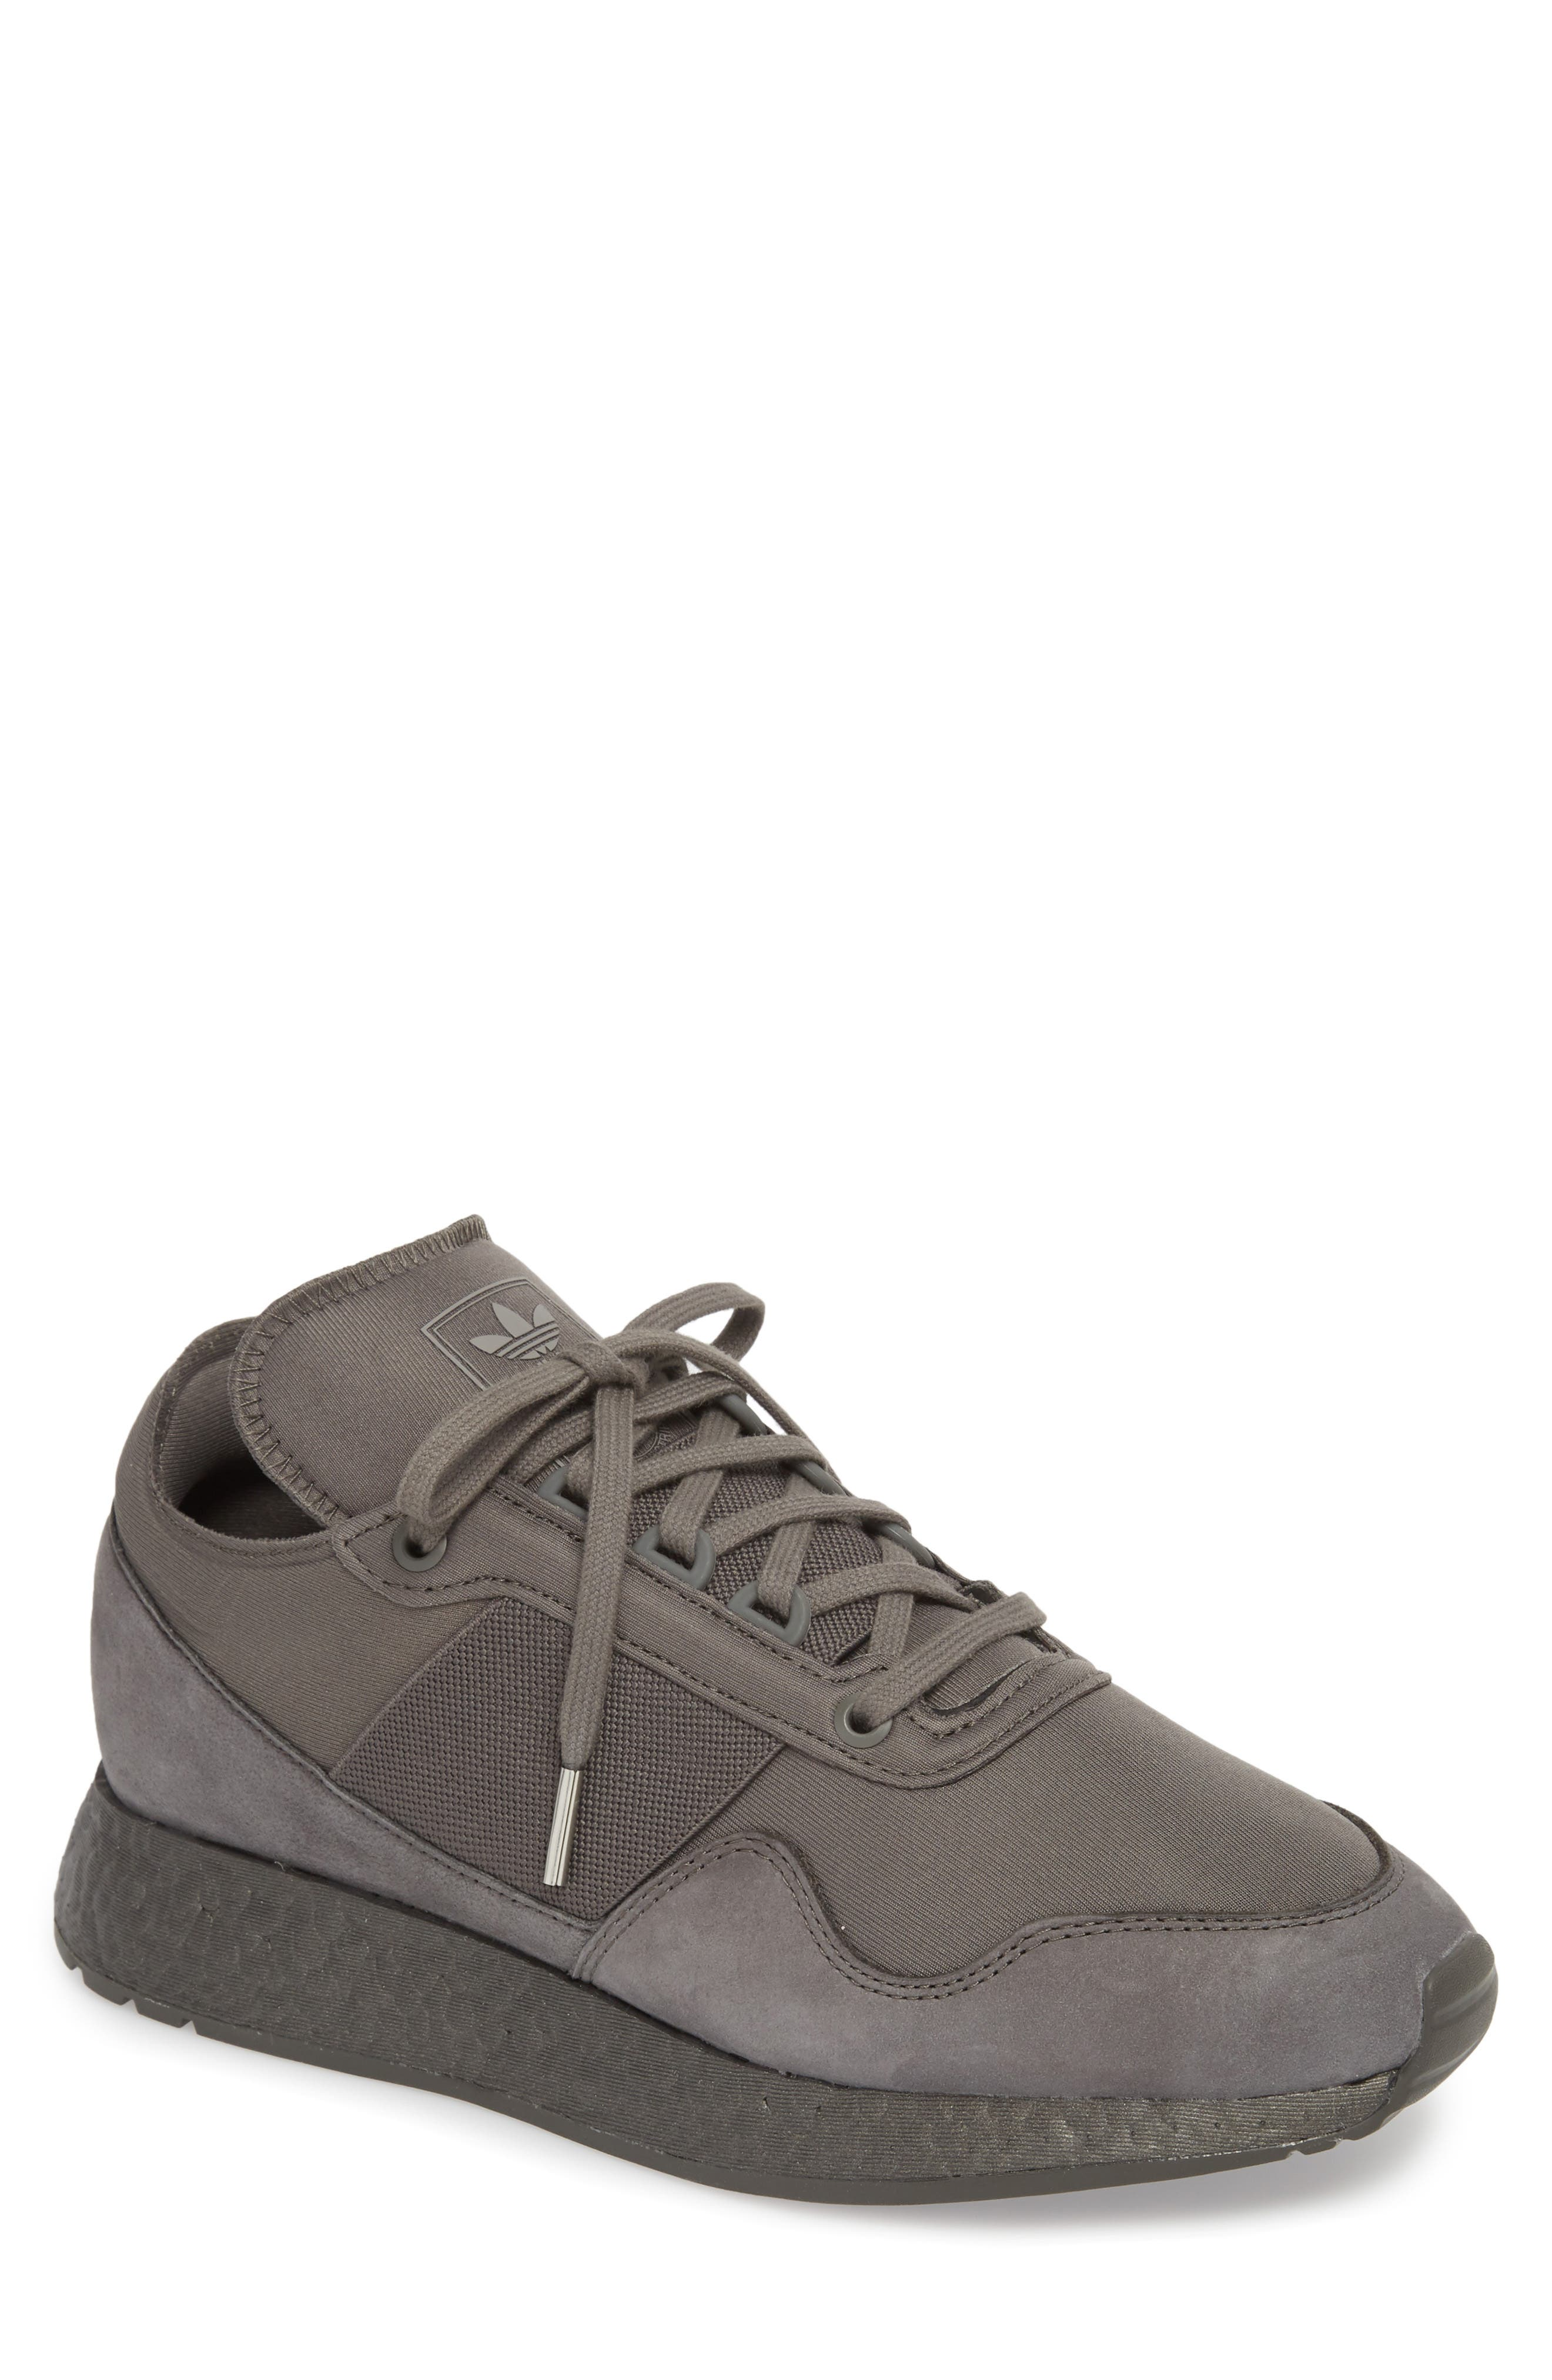 New York Present Arsham Sneaker,                         Main,                         color, Grey